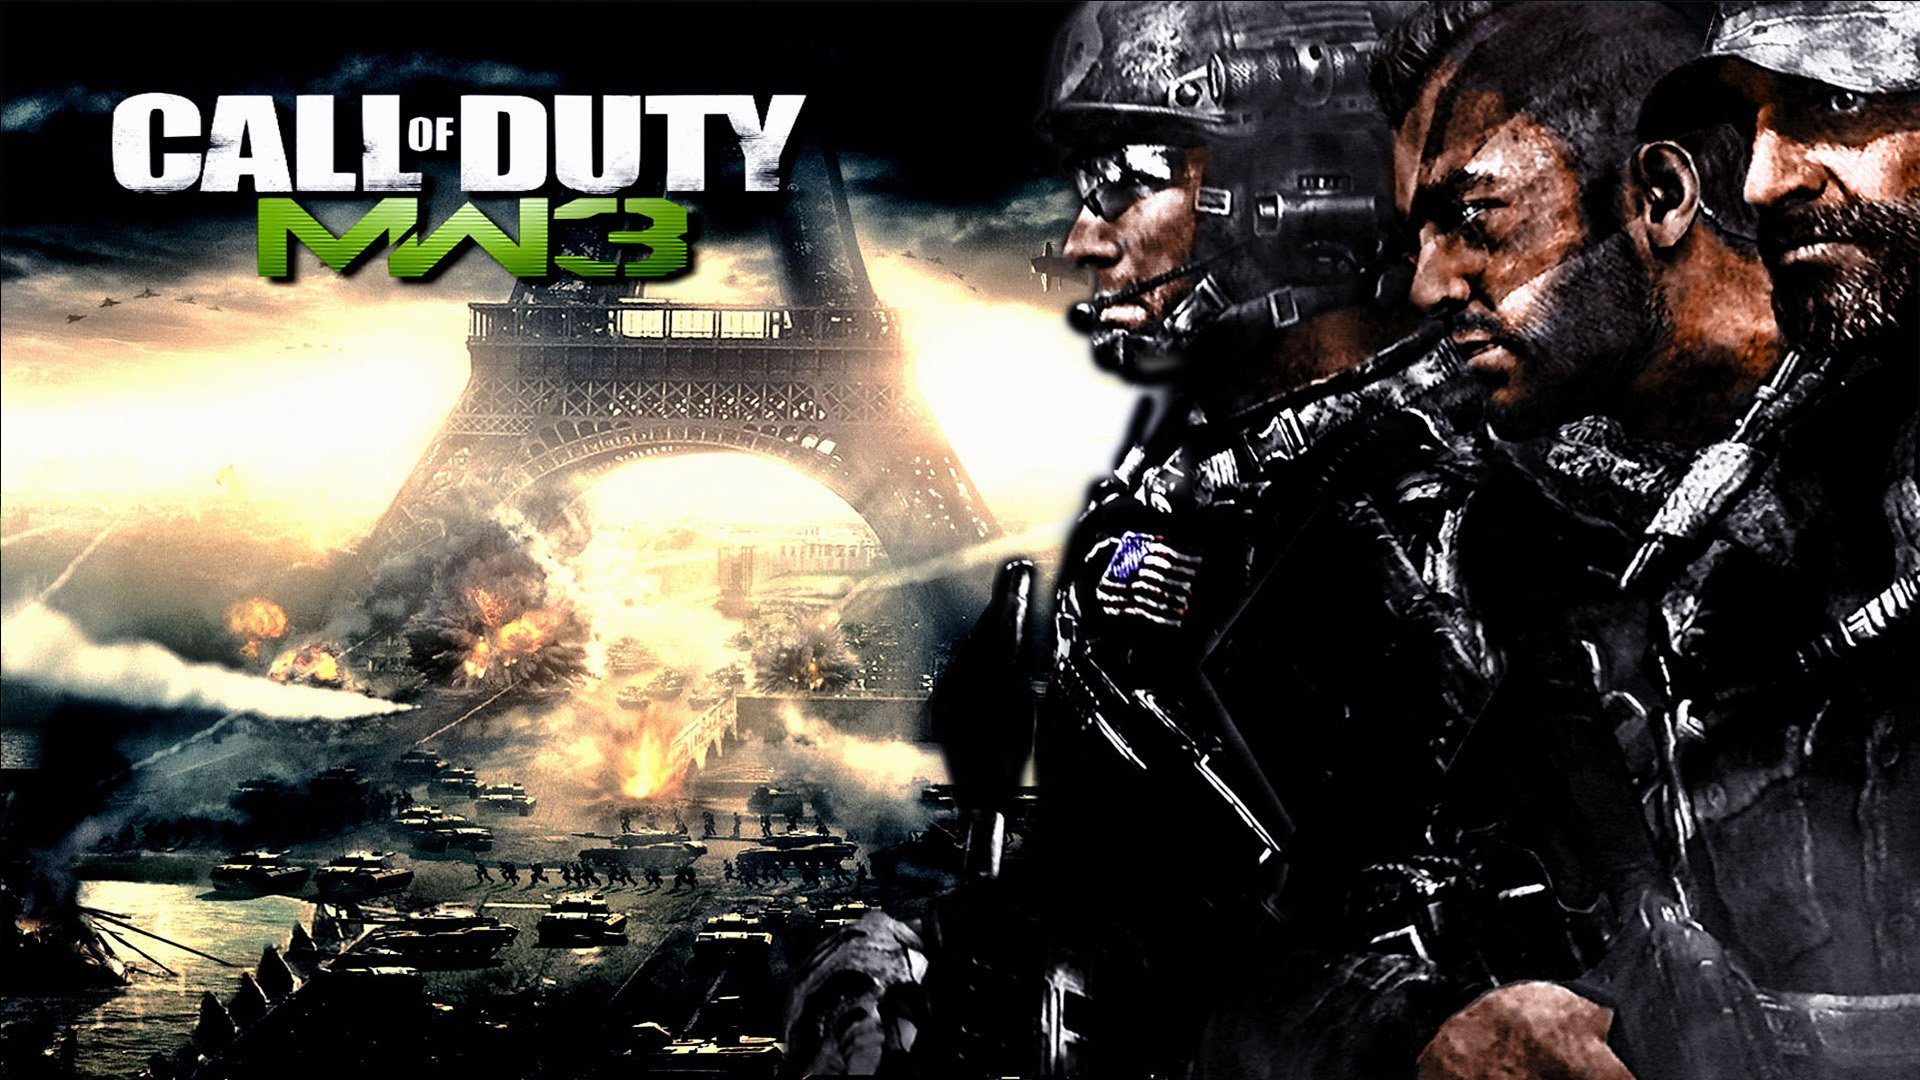 Call of Duty: Modern Warfare 3 HD Wallpaper | Background ...